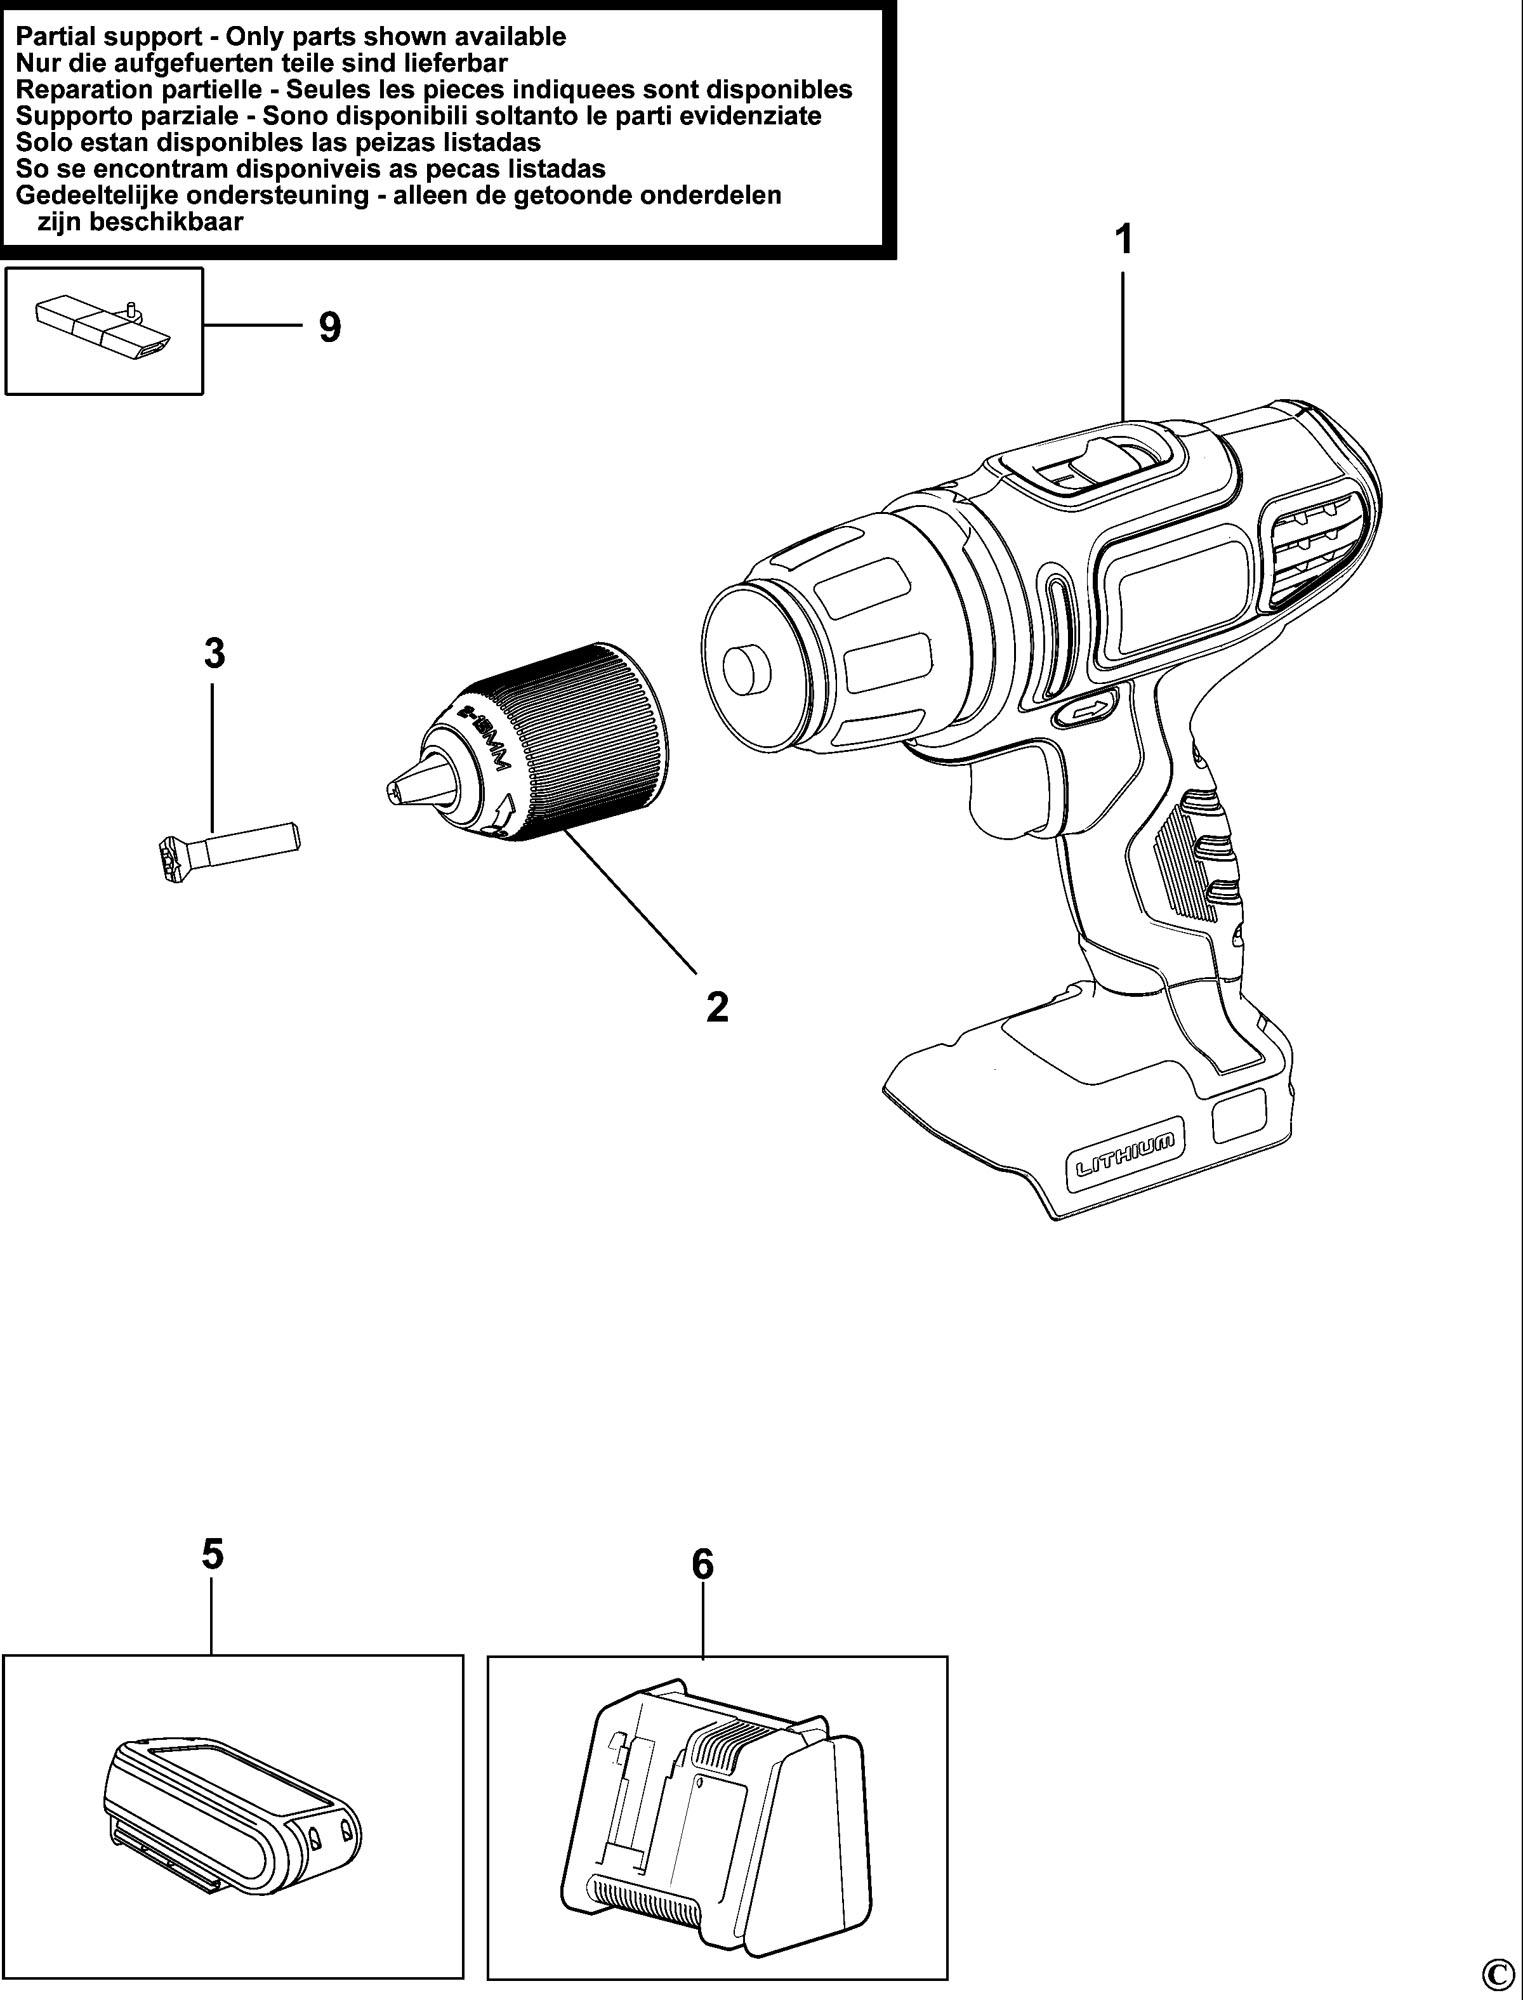 Spares for Black & Decker Hp188f4lbk Cordless Drill (type